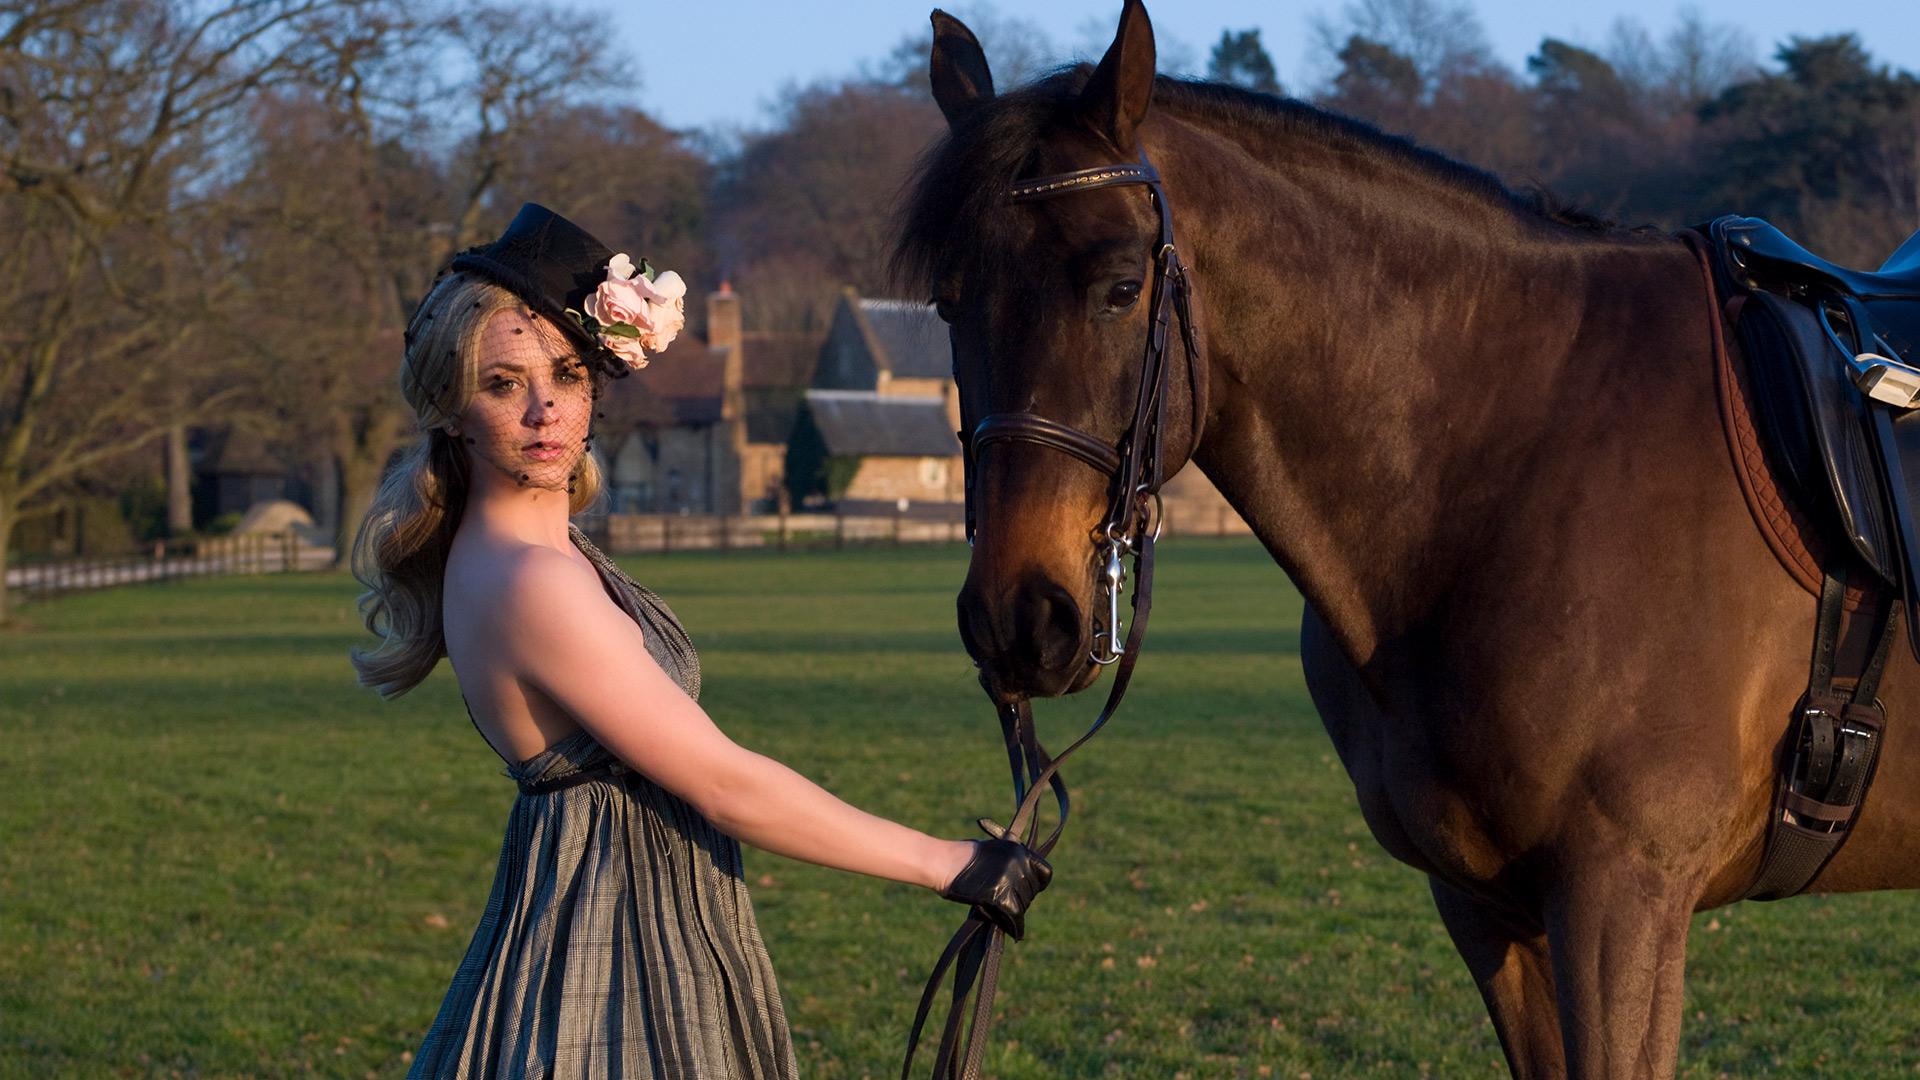 She shows horses under a secret name